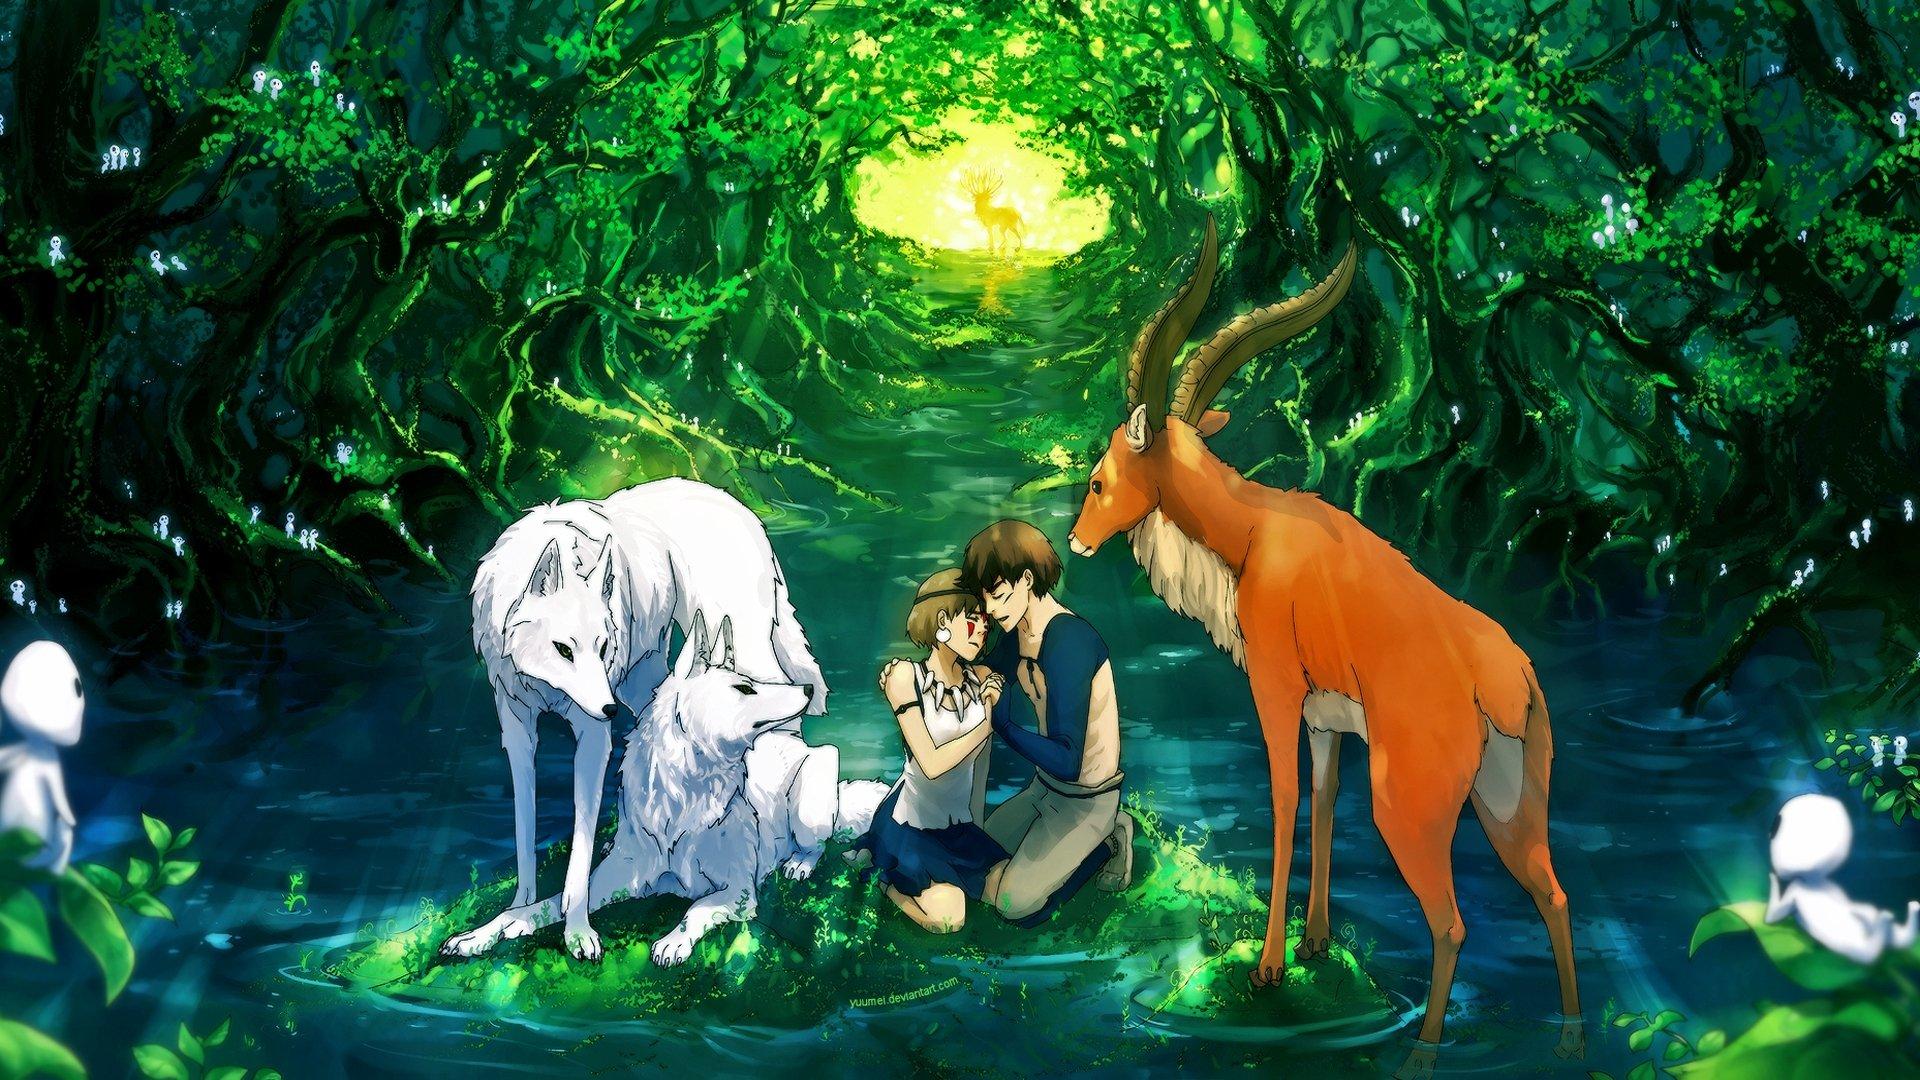 Anime girl character beautiful animal forest deer couple wallpaper 1920x1080 913205 wallpaperup